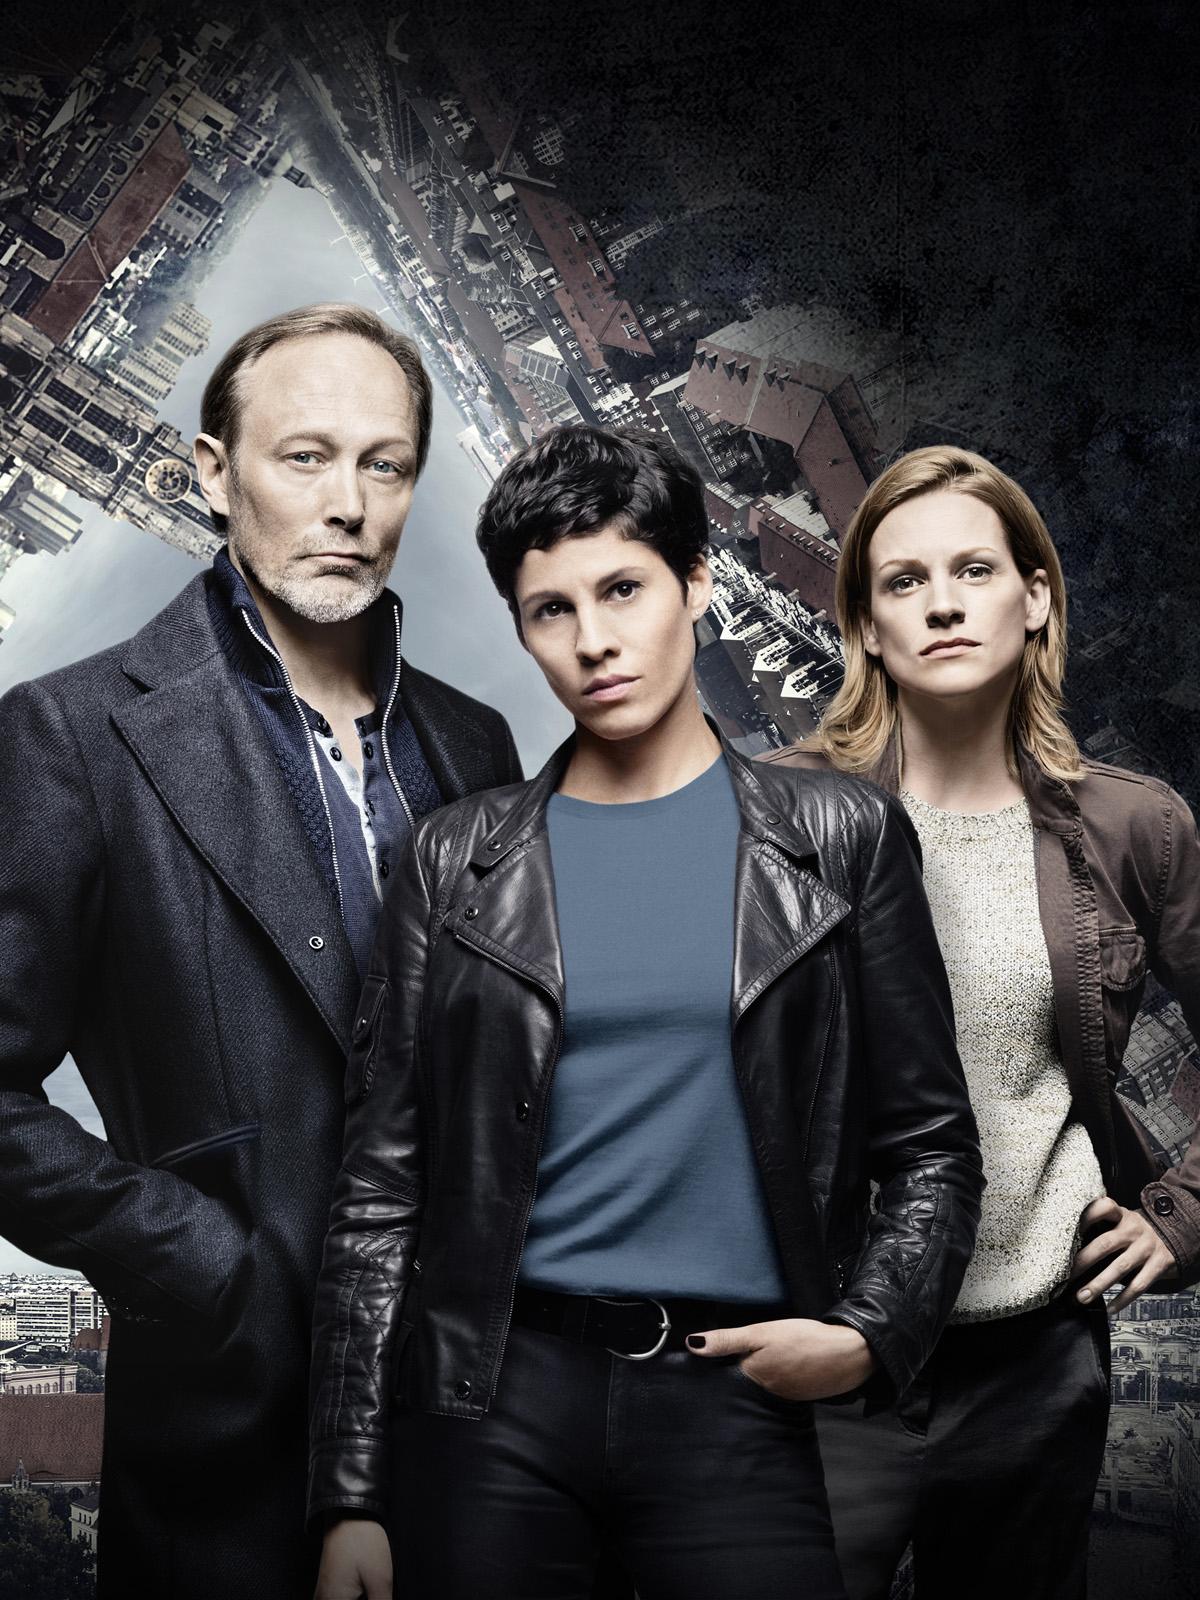 The Team Staffel 3